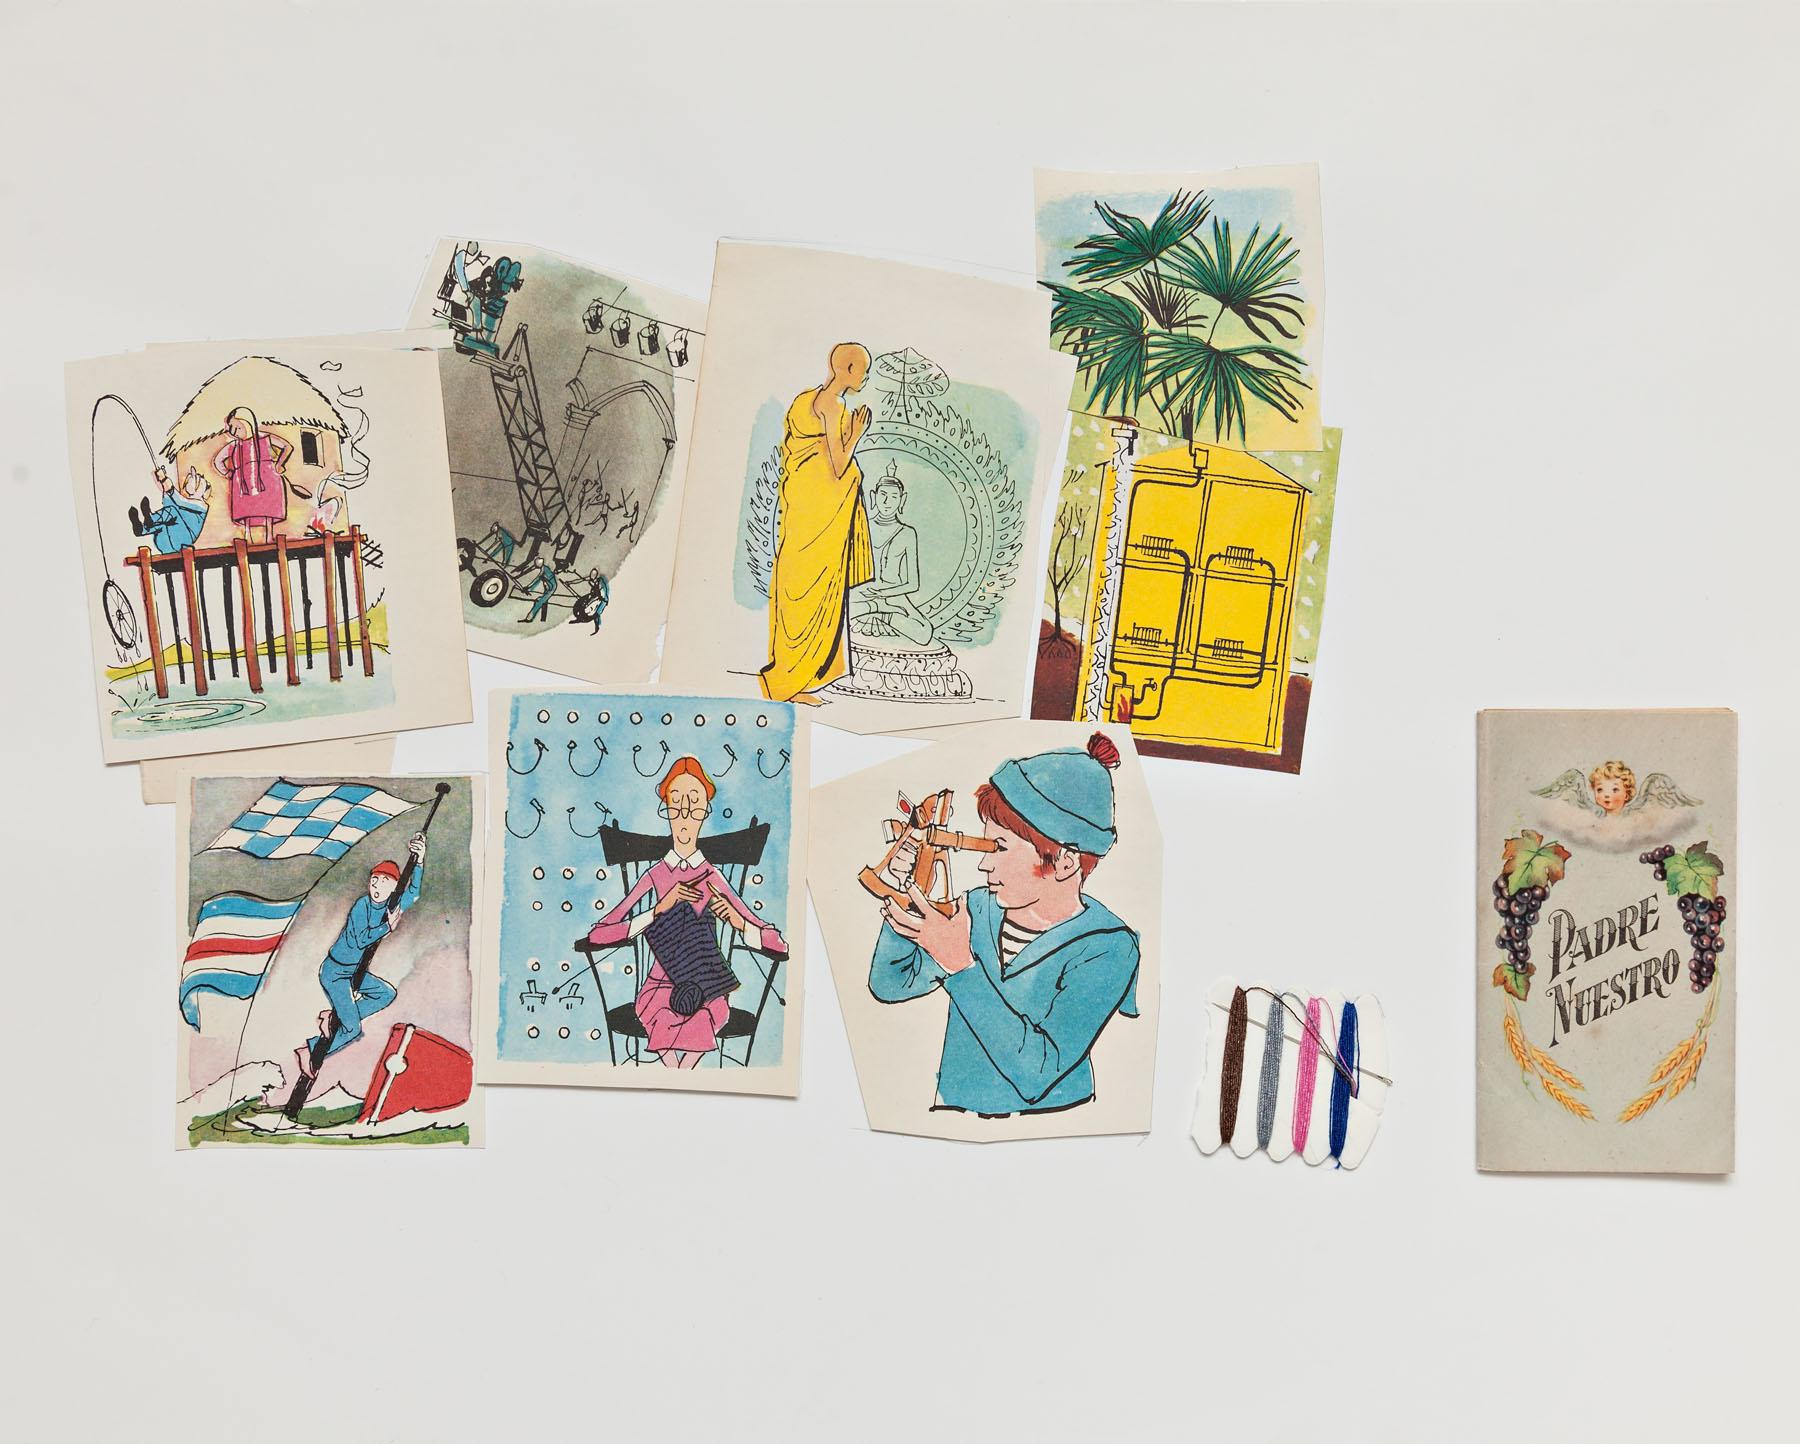 Serie Cuarentena, papel collage, 28 cm x 35 cm, 2020